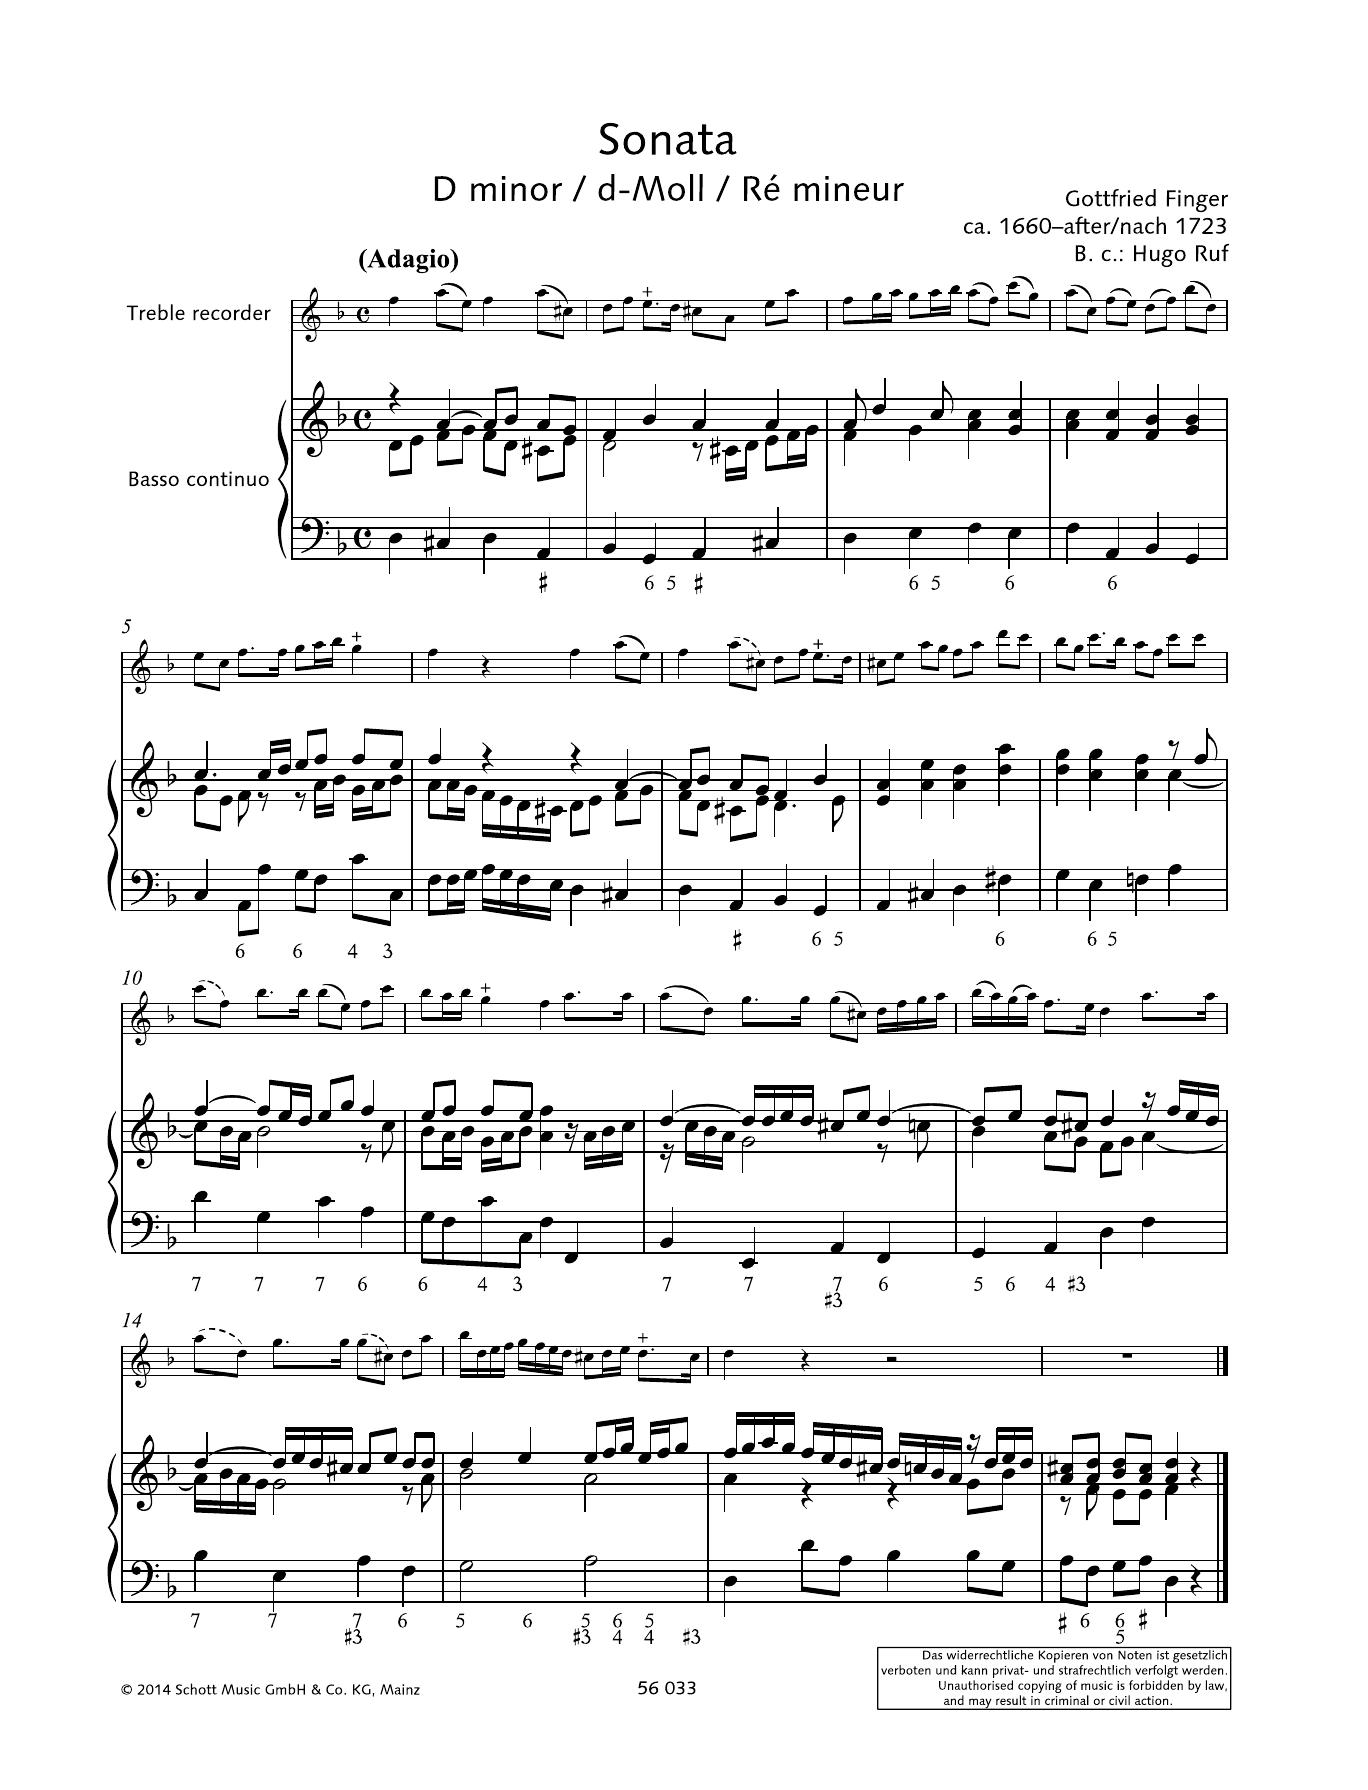 Sonata D Minor Partition Digitale